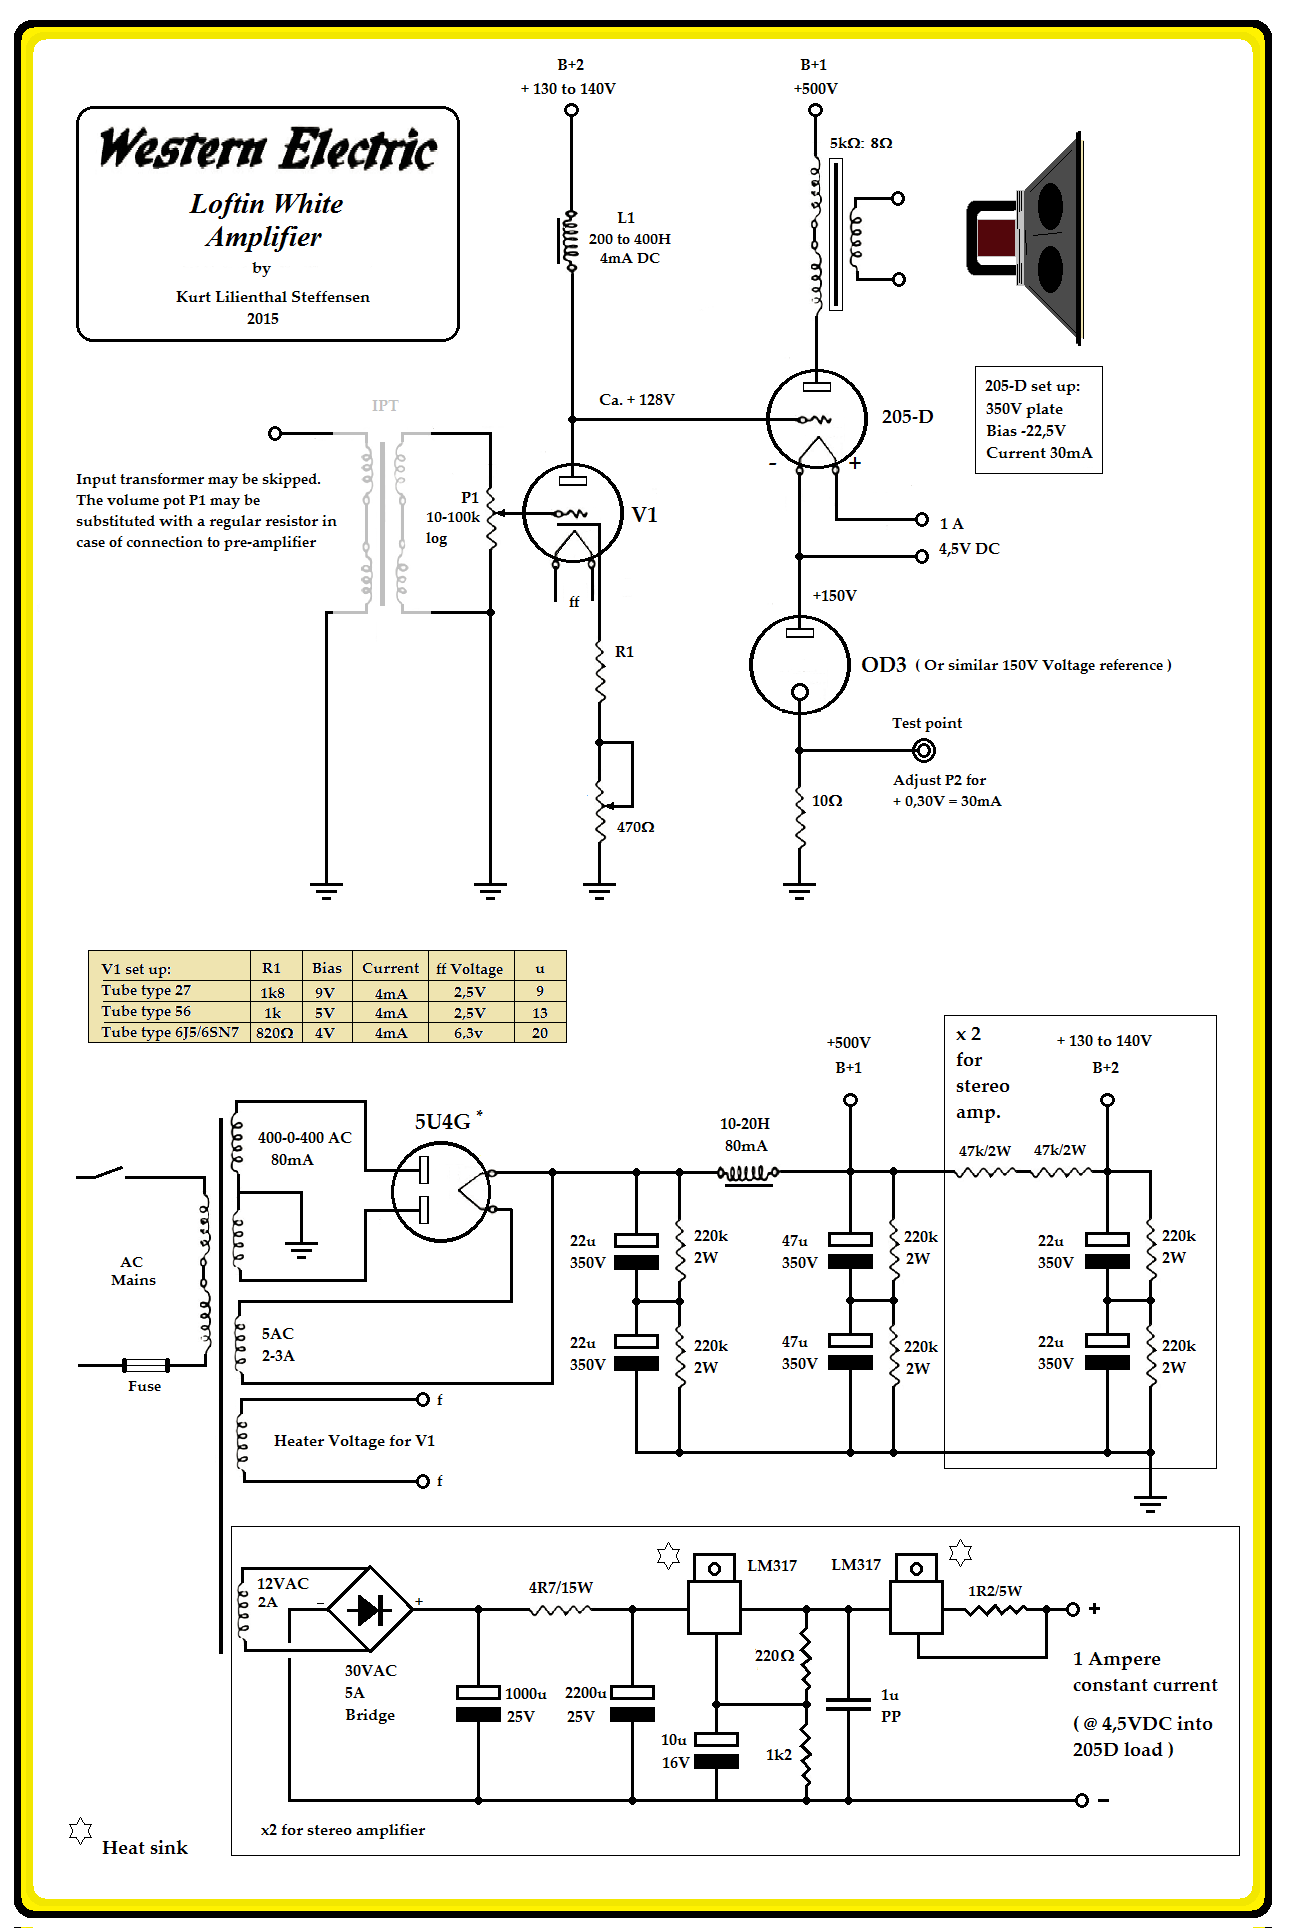 Swell 100 Amplifiers Part 1 1916 45 Lilienthal Engineering Wiring Cloud Waroletkolfr09Org